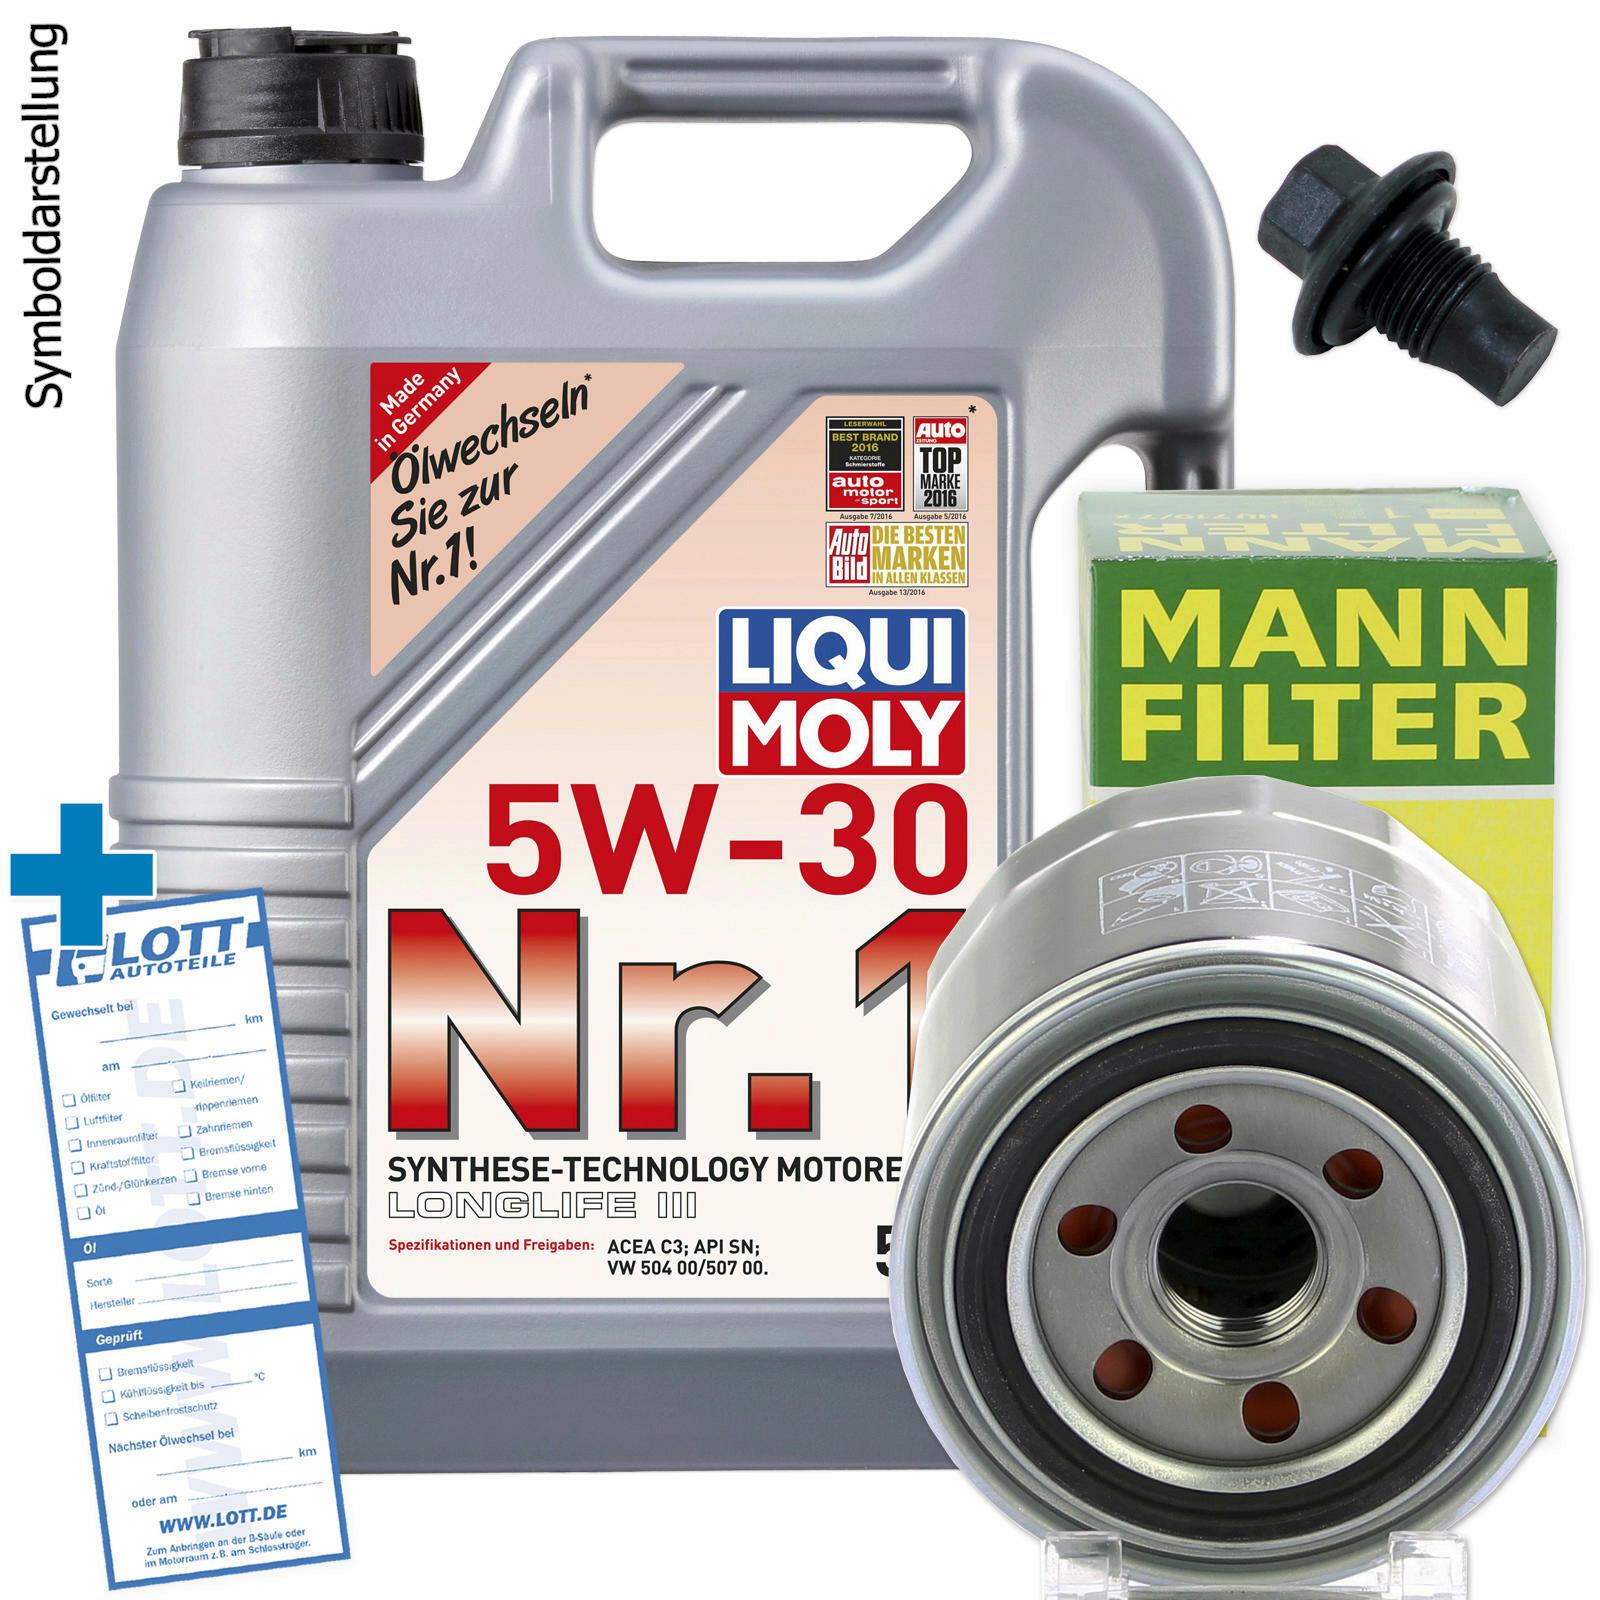 Ölwechsel set 5l 5w30 Öl motoröl liqui moly + mann Ölfilter +